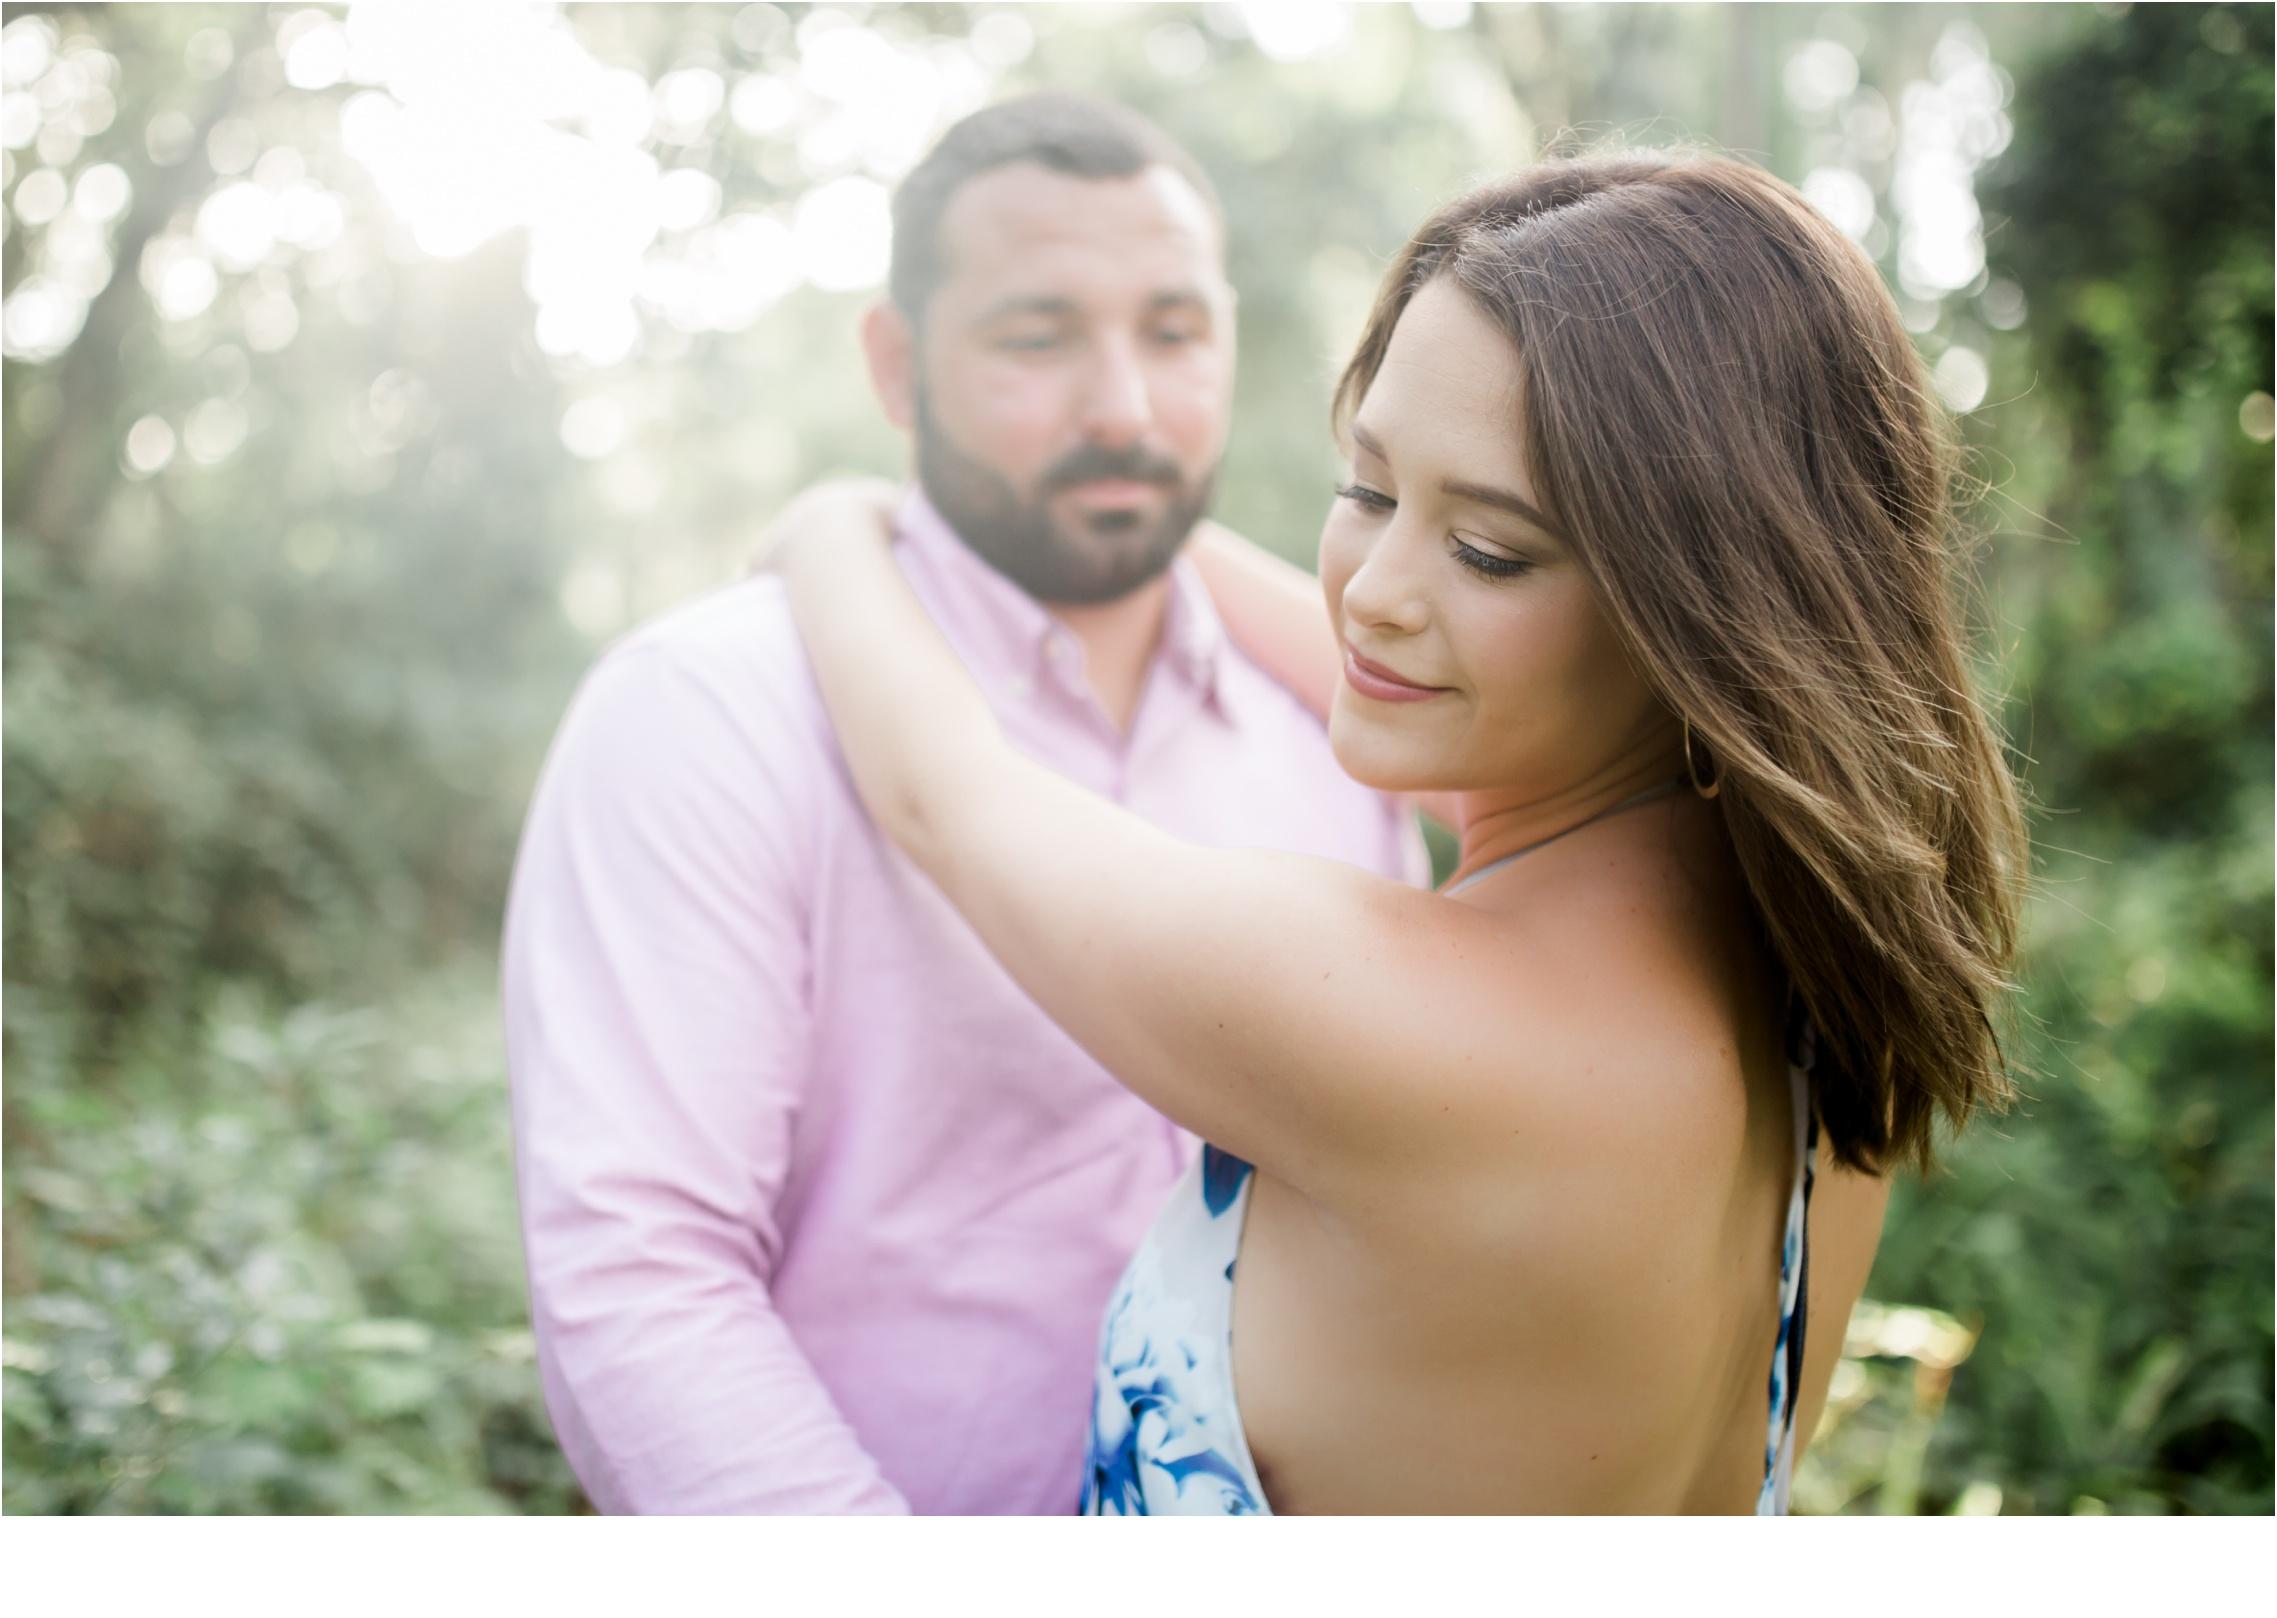 Rainey_Gregg_Photography_St._Simons_Island_Georgia_California_Wedding_Portrait_Photography_0143.jpg